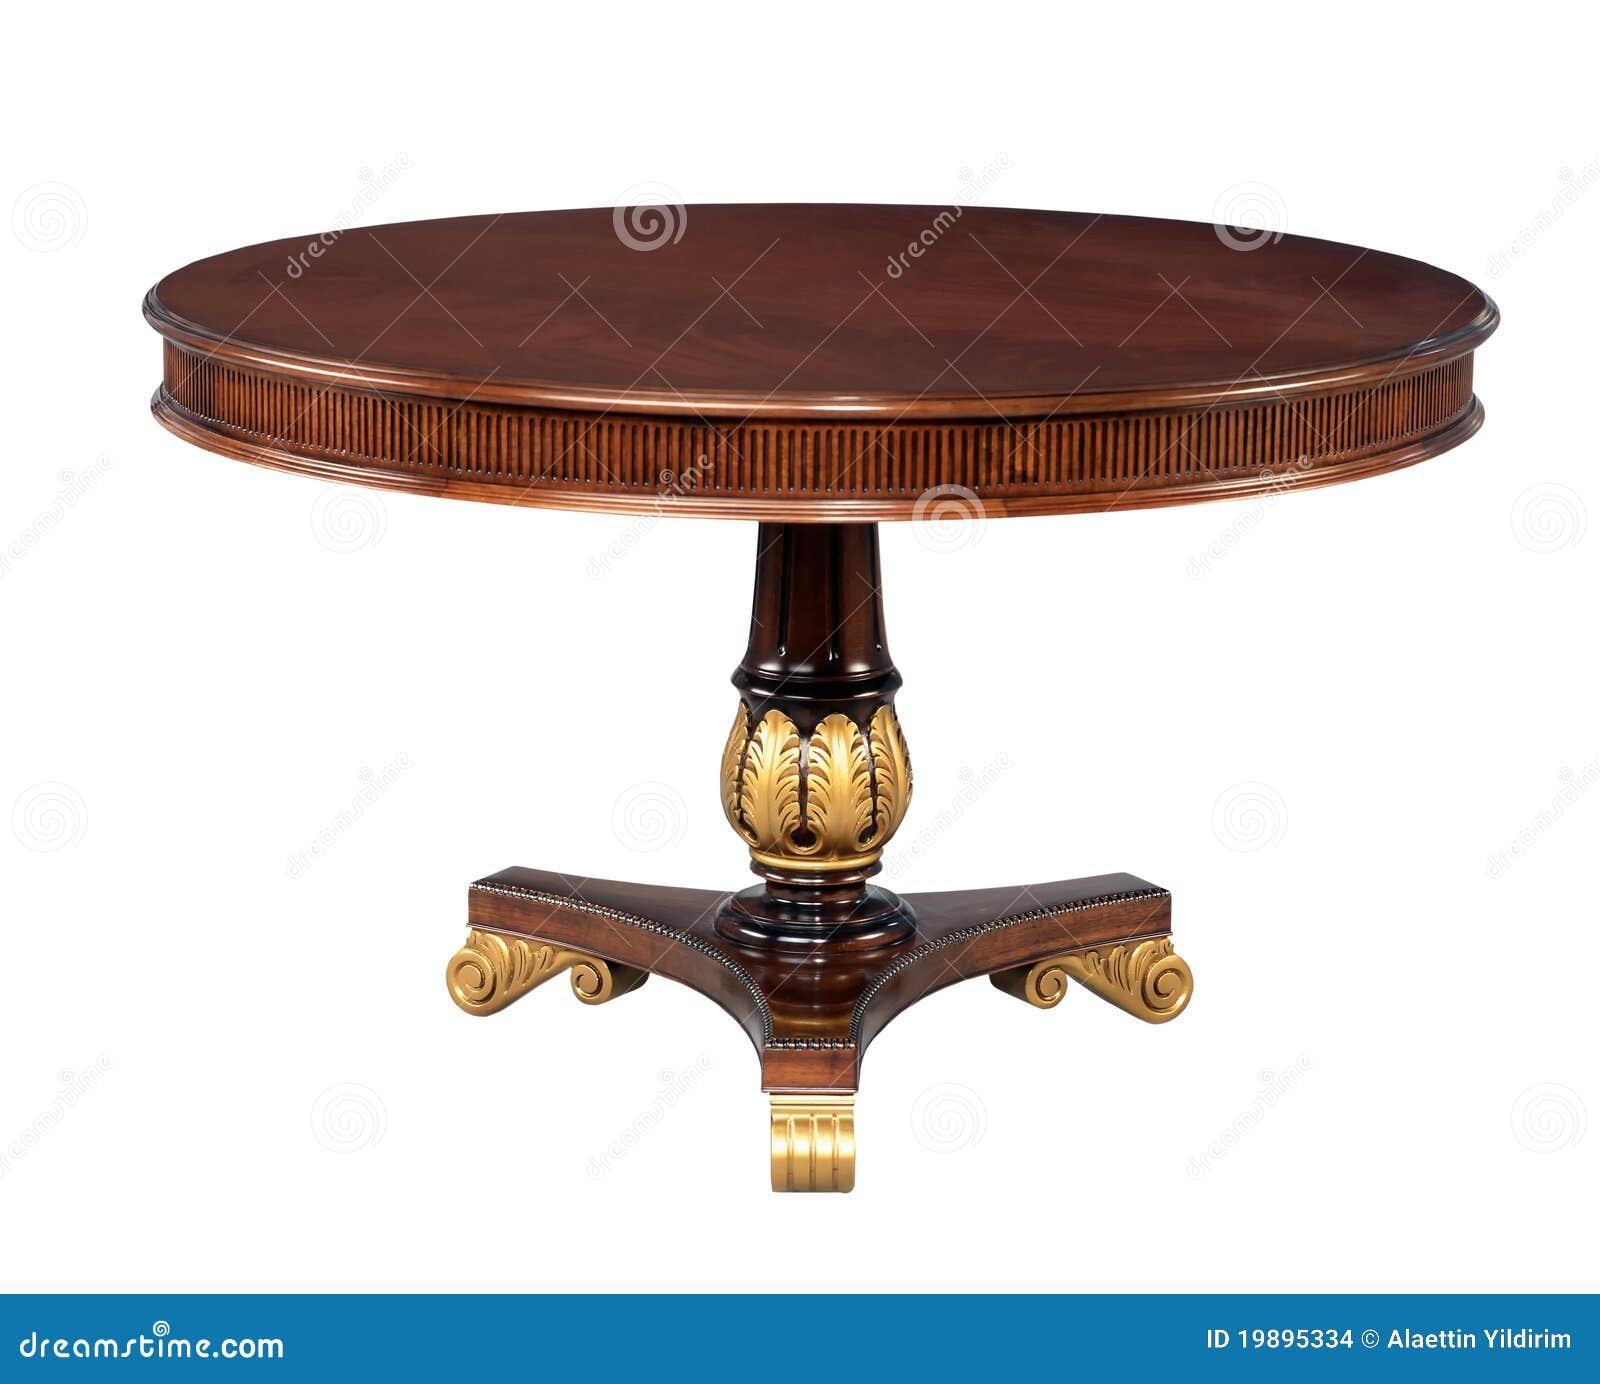 Mesa redonda de madera antigua imagenes de archivo for Mesas redondas de madera